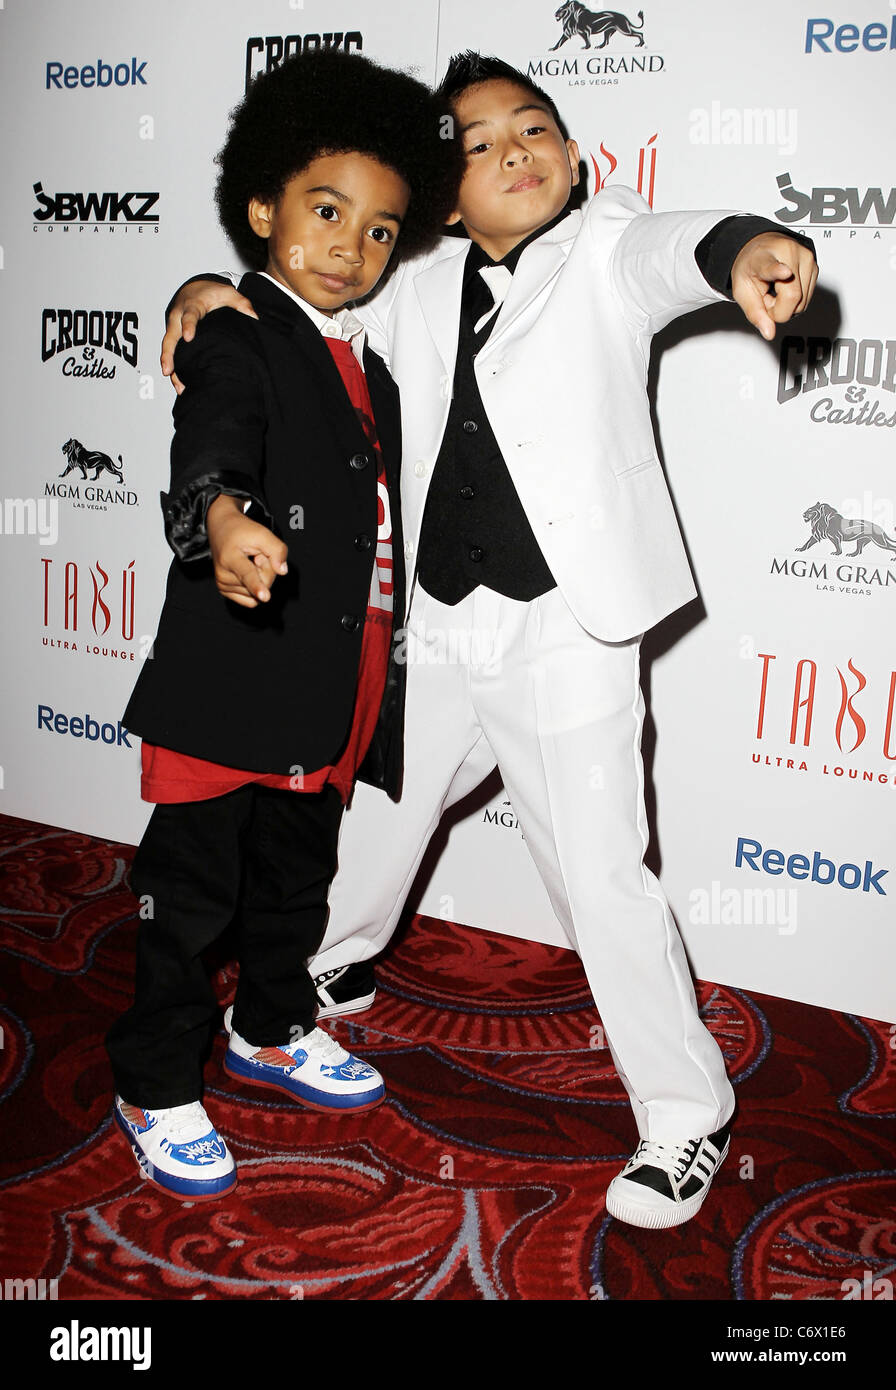 Baby Boogaloo and Bailrok The world famous dance crew Jabbawockeez present Mus.I.C. at MGM Grand Resort Casino. - Stock Image